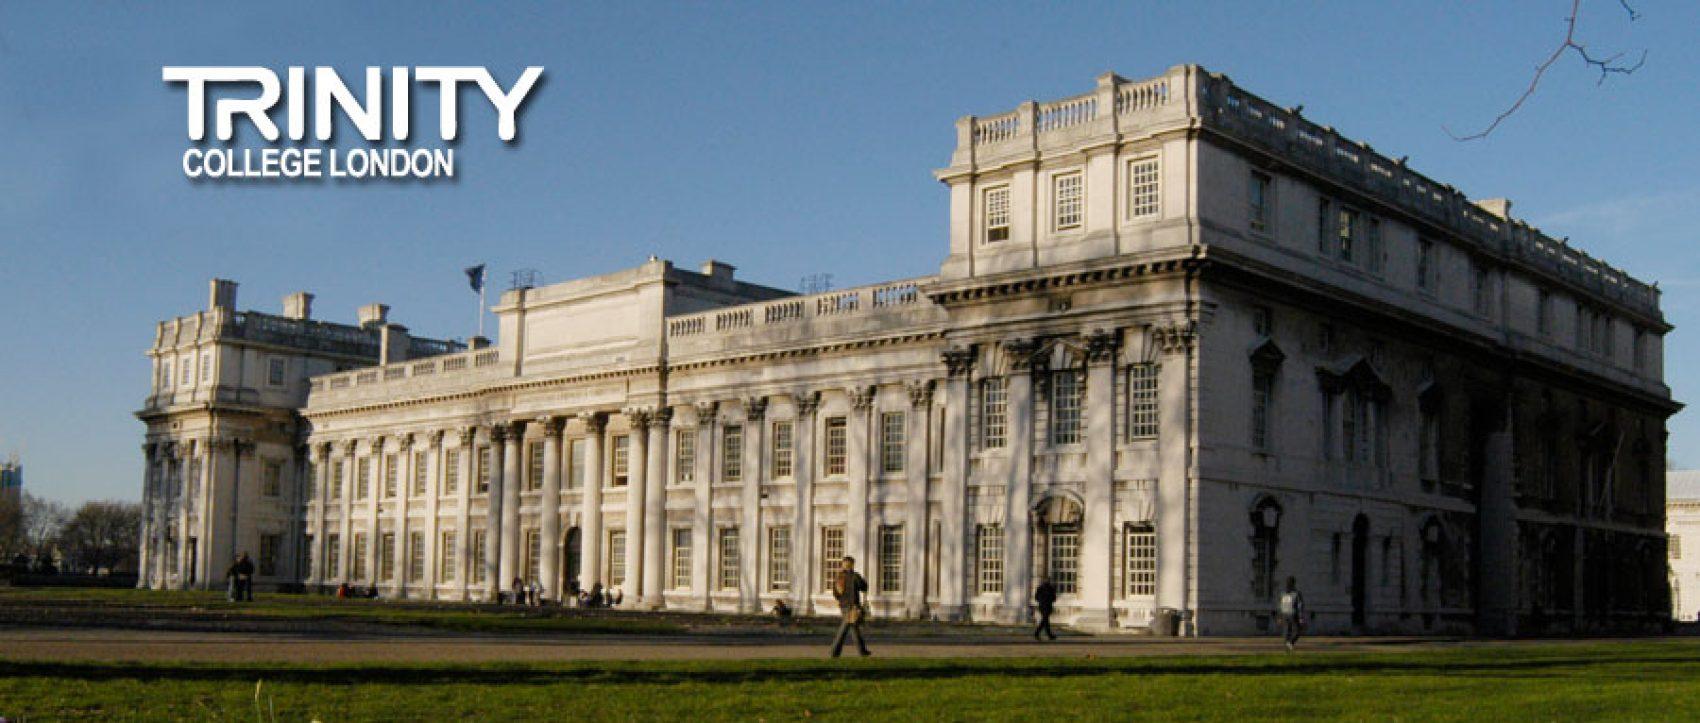 Trinity Gollege London